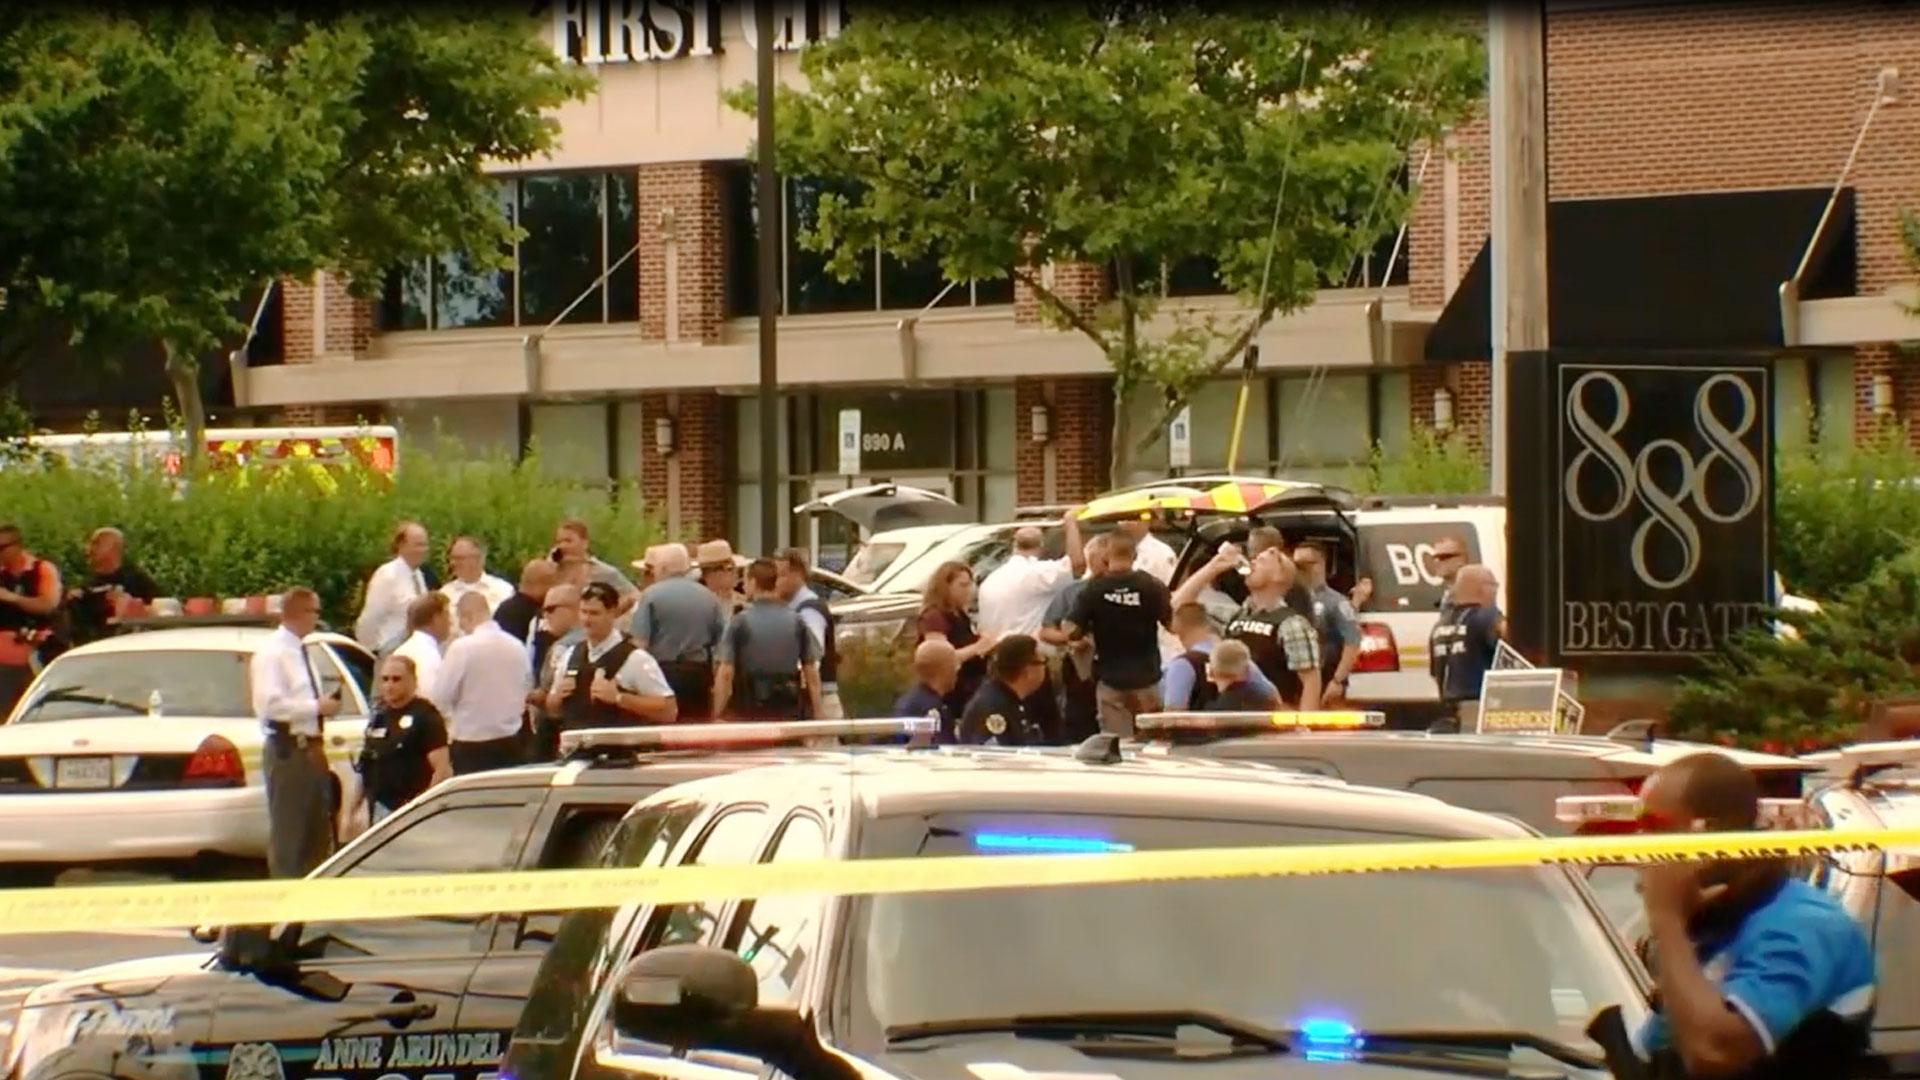 KELO The Capital Gazette Annapolis Shooting